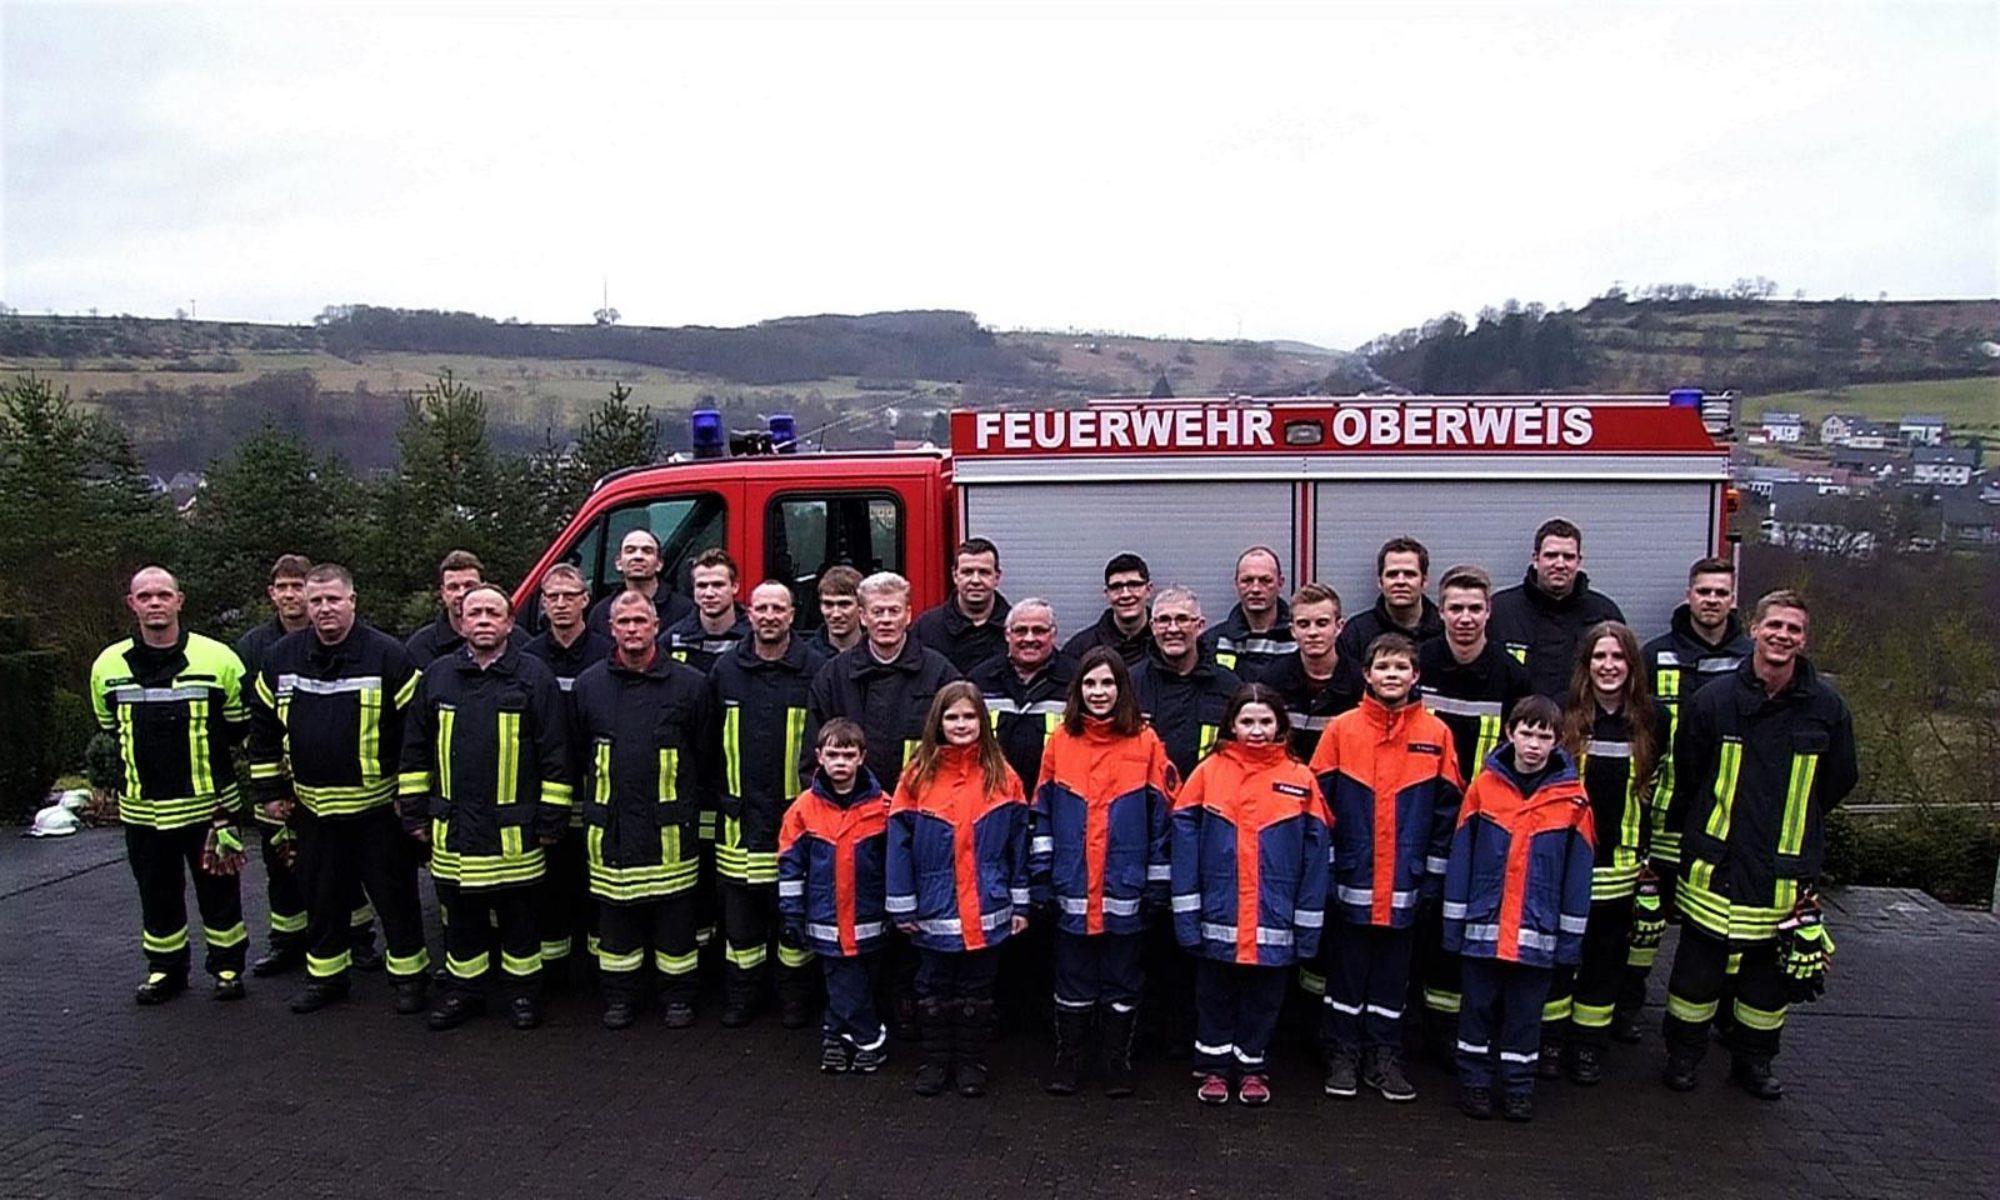 Feuerwehr Oberweis